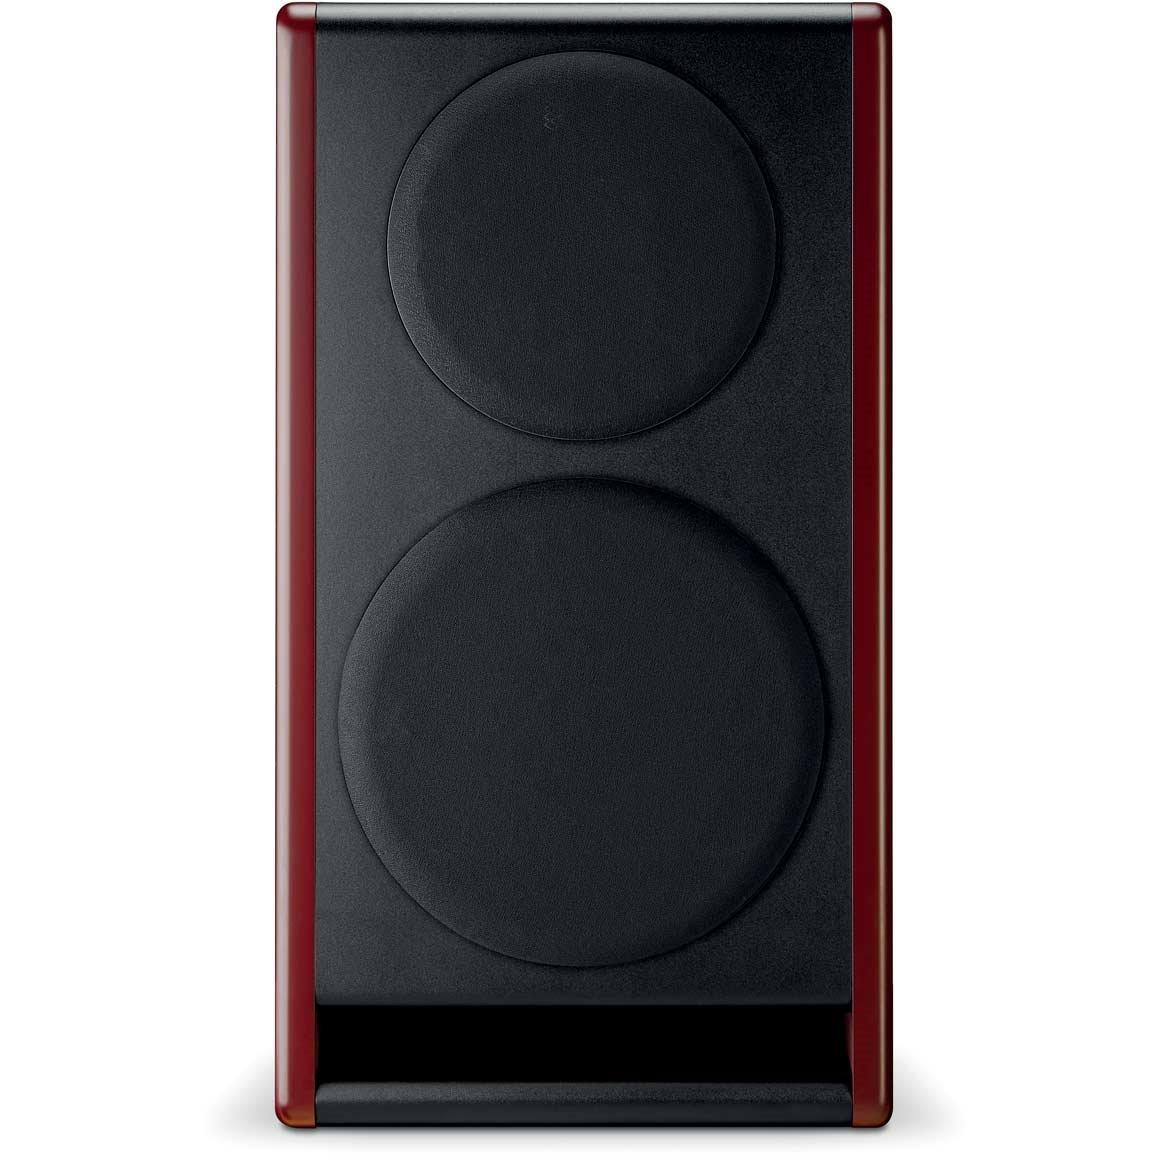 Trio11 Be - Professional monitoring loudspeaker - Face cache